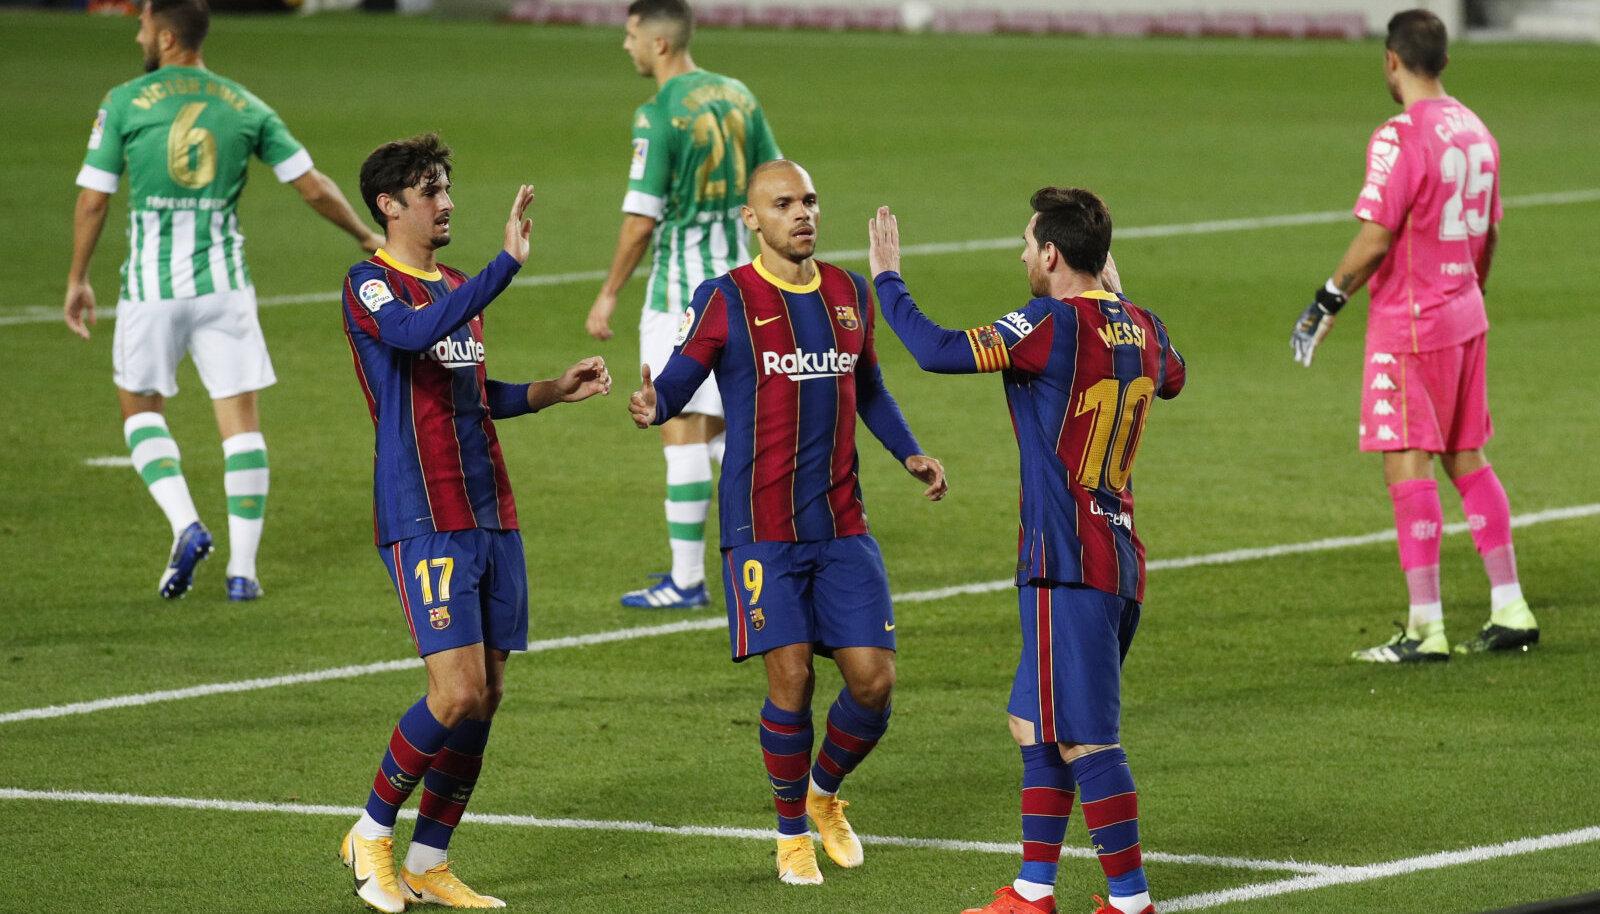 Vasakult: Fransisco Trincao, Martin Braithwaite ja Lionel Messi